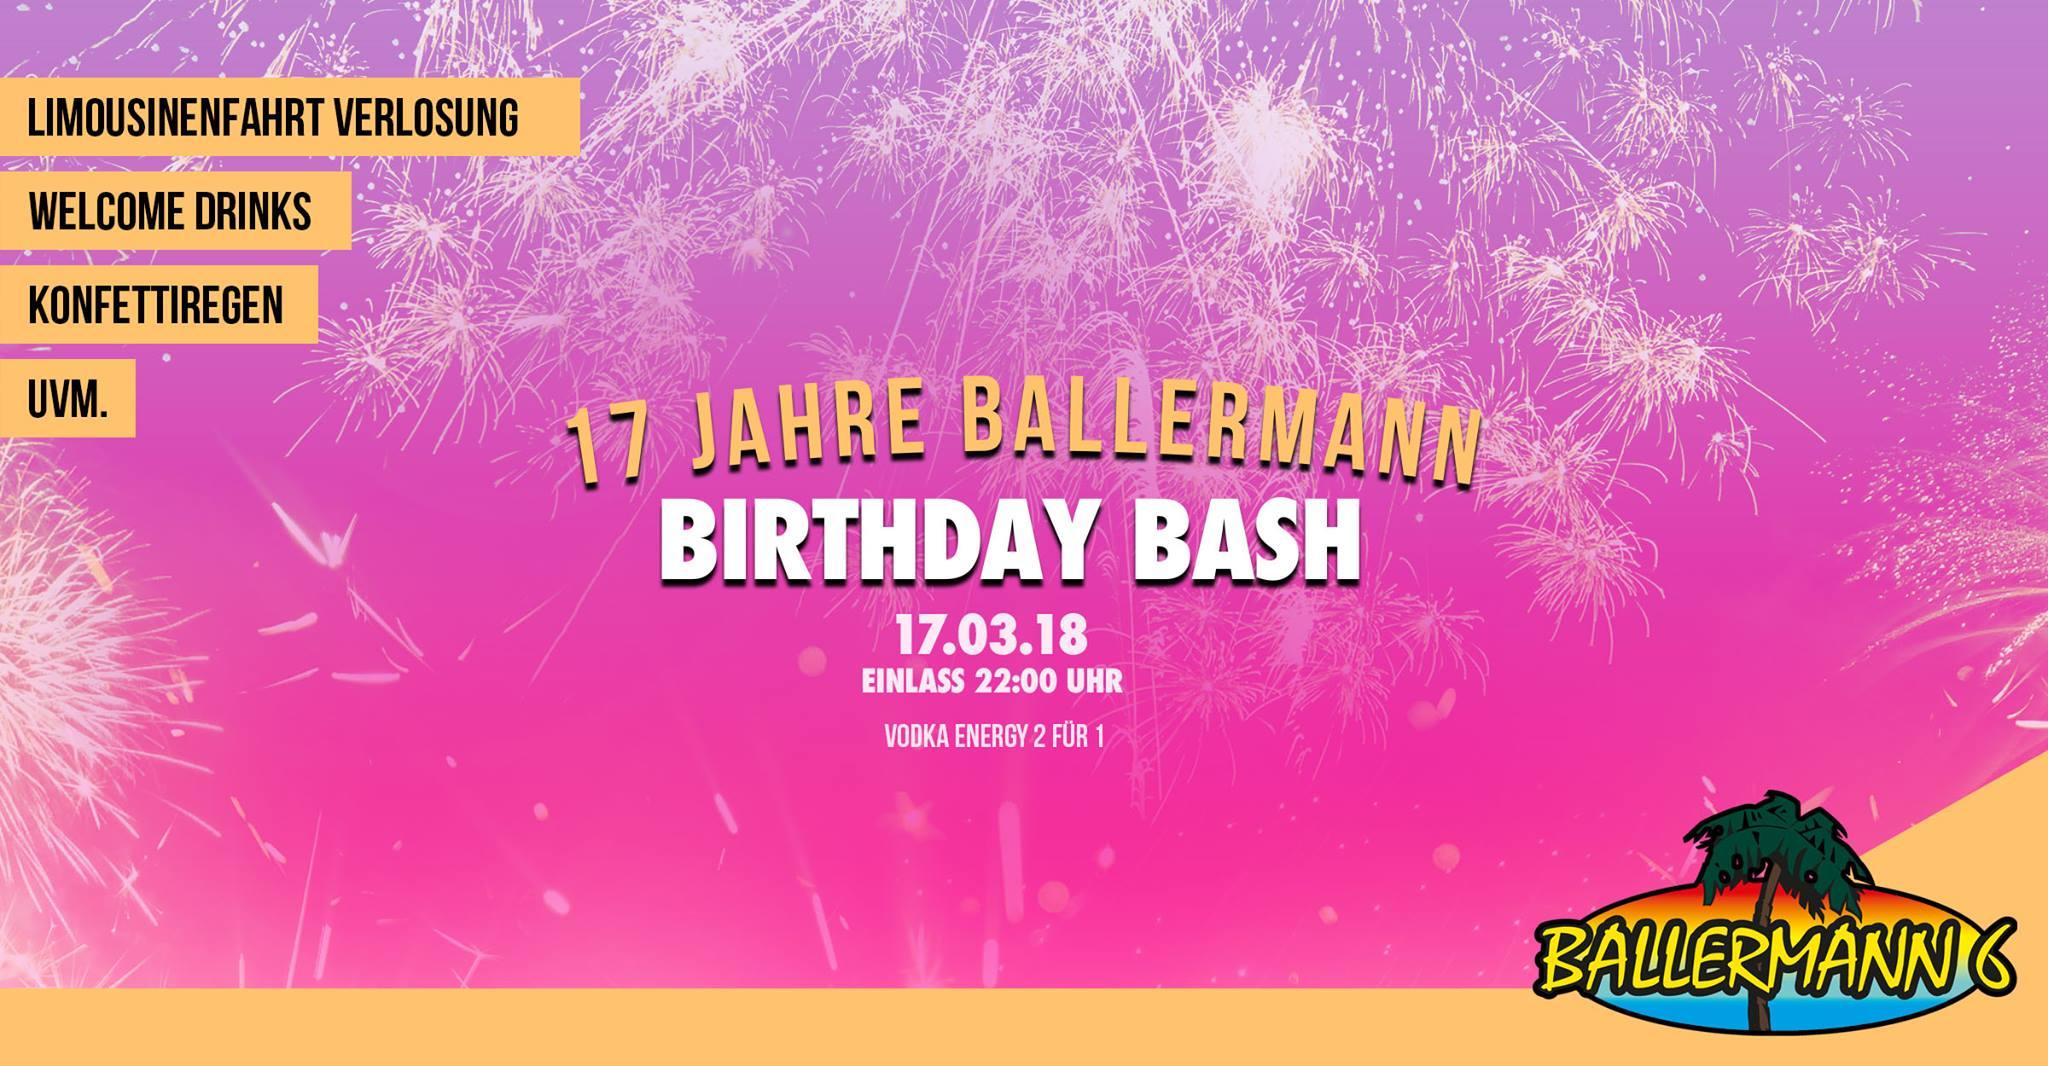 Ballermann Birthday Bash